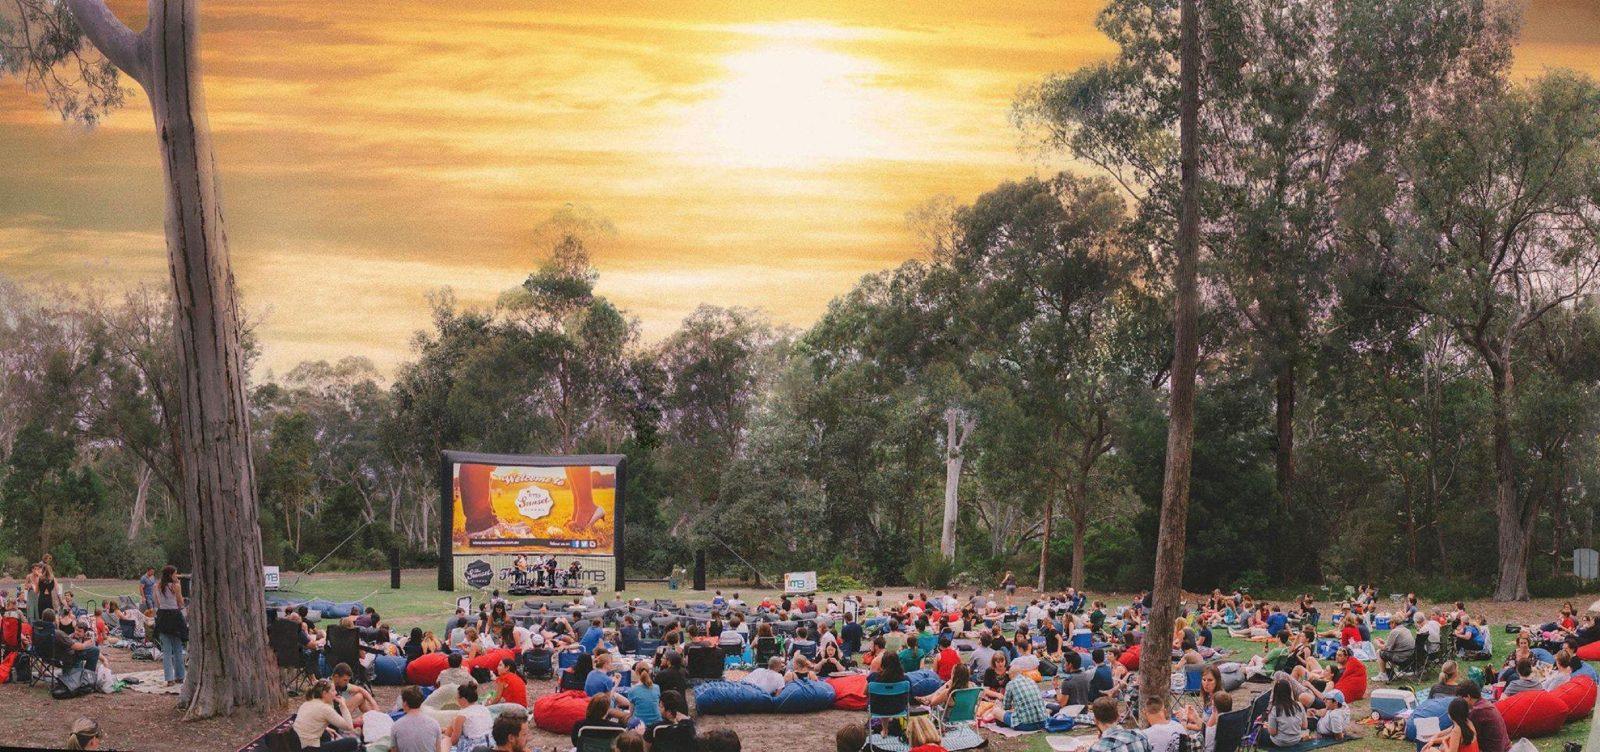 Crowd enjoying the beautiful setting sun priot to the screening of Sunset Cinema